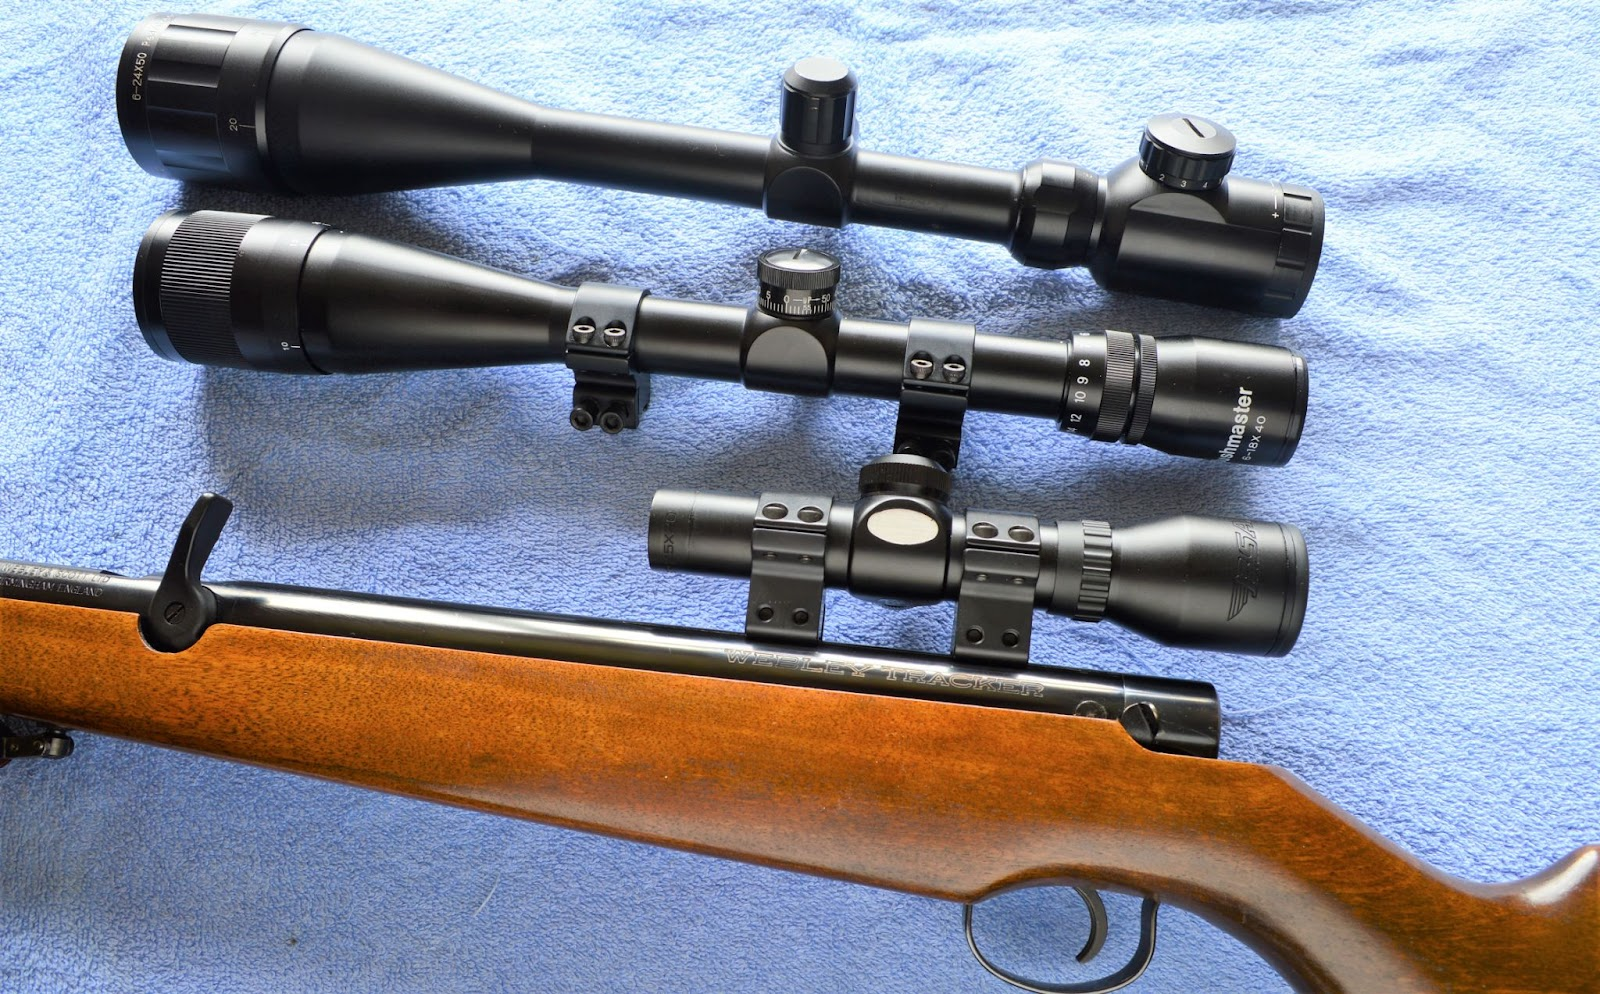 sizing up your scope